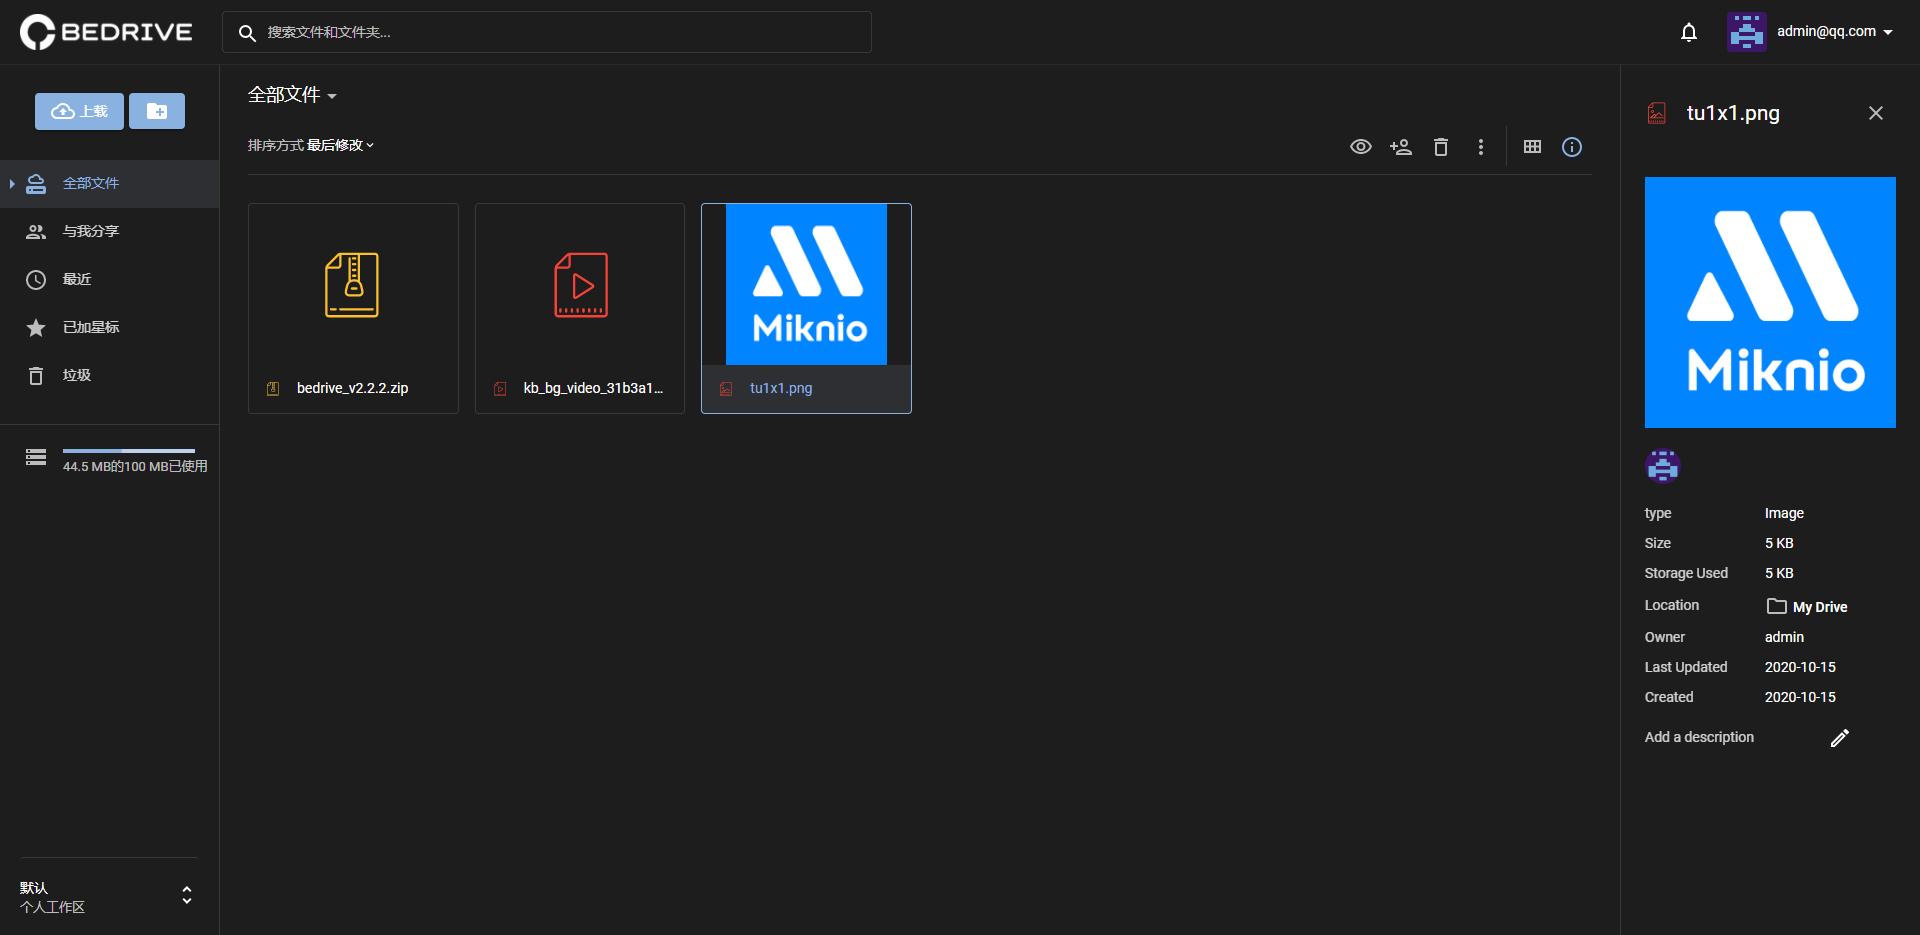 BeDrive v2.2.2国外专业的文件上传网盘PHP网站源码-常网小站Miknio